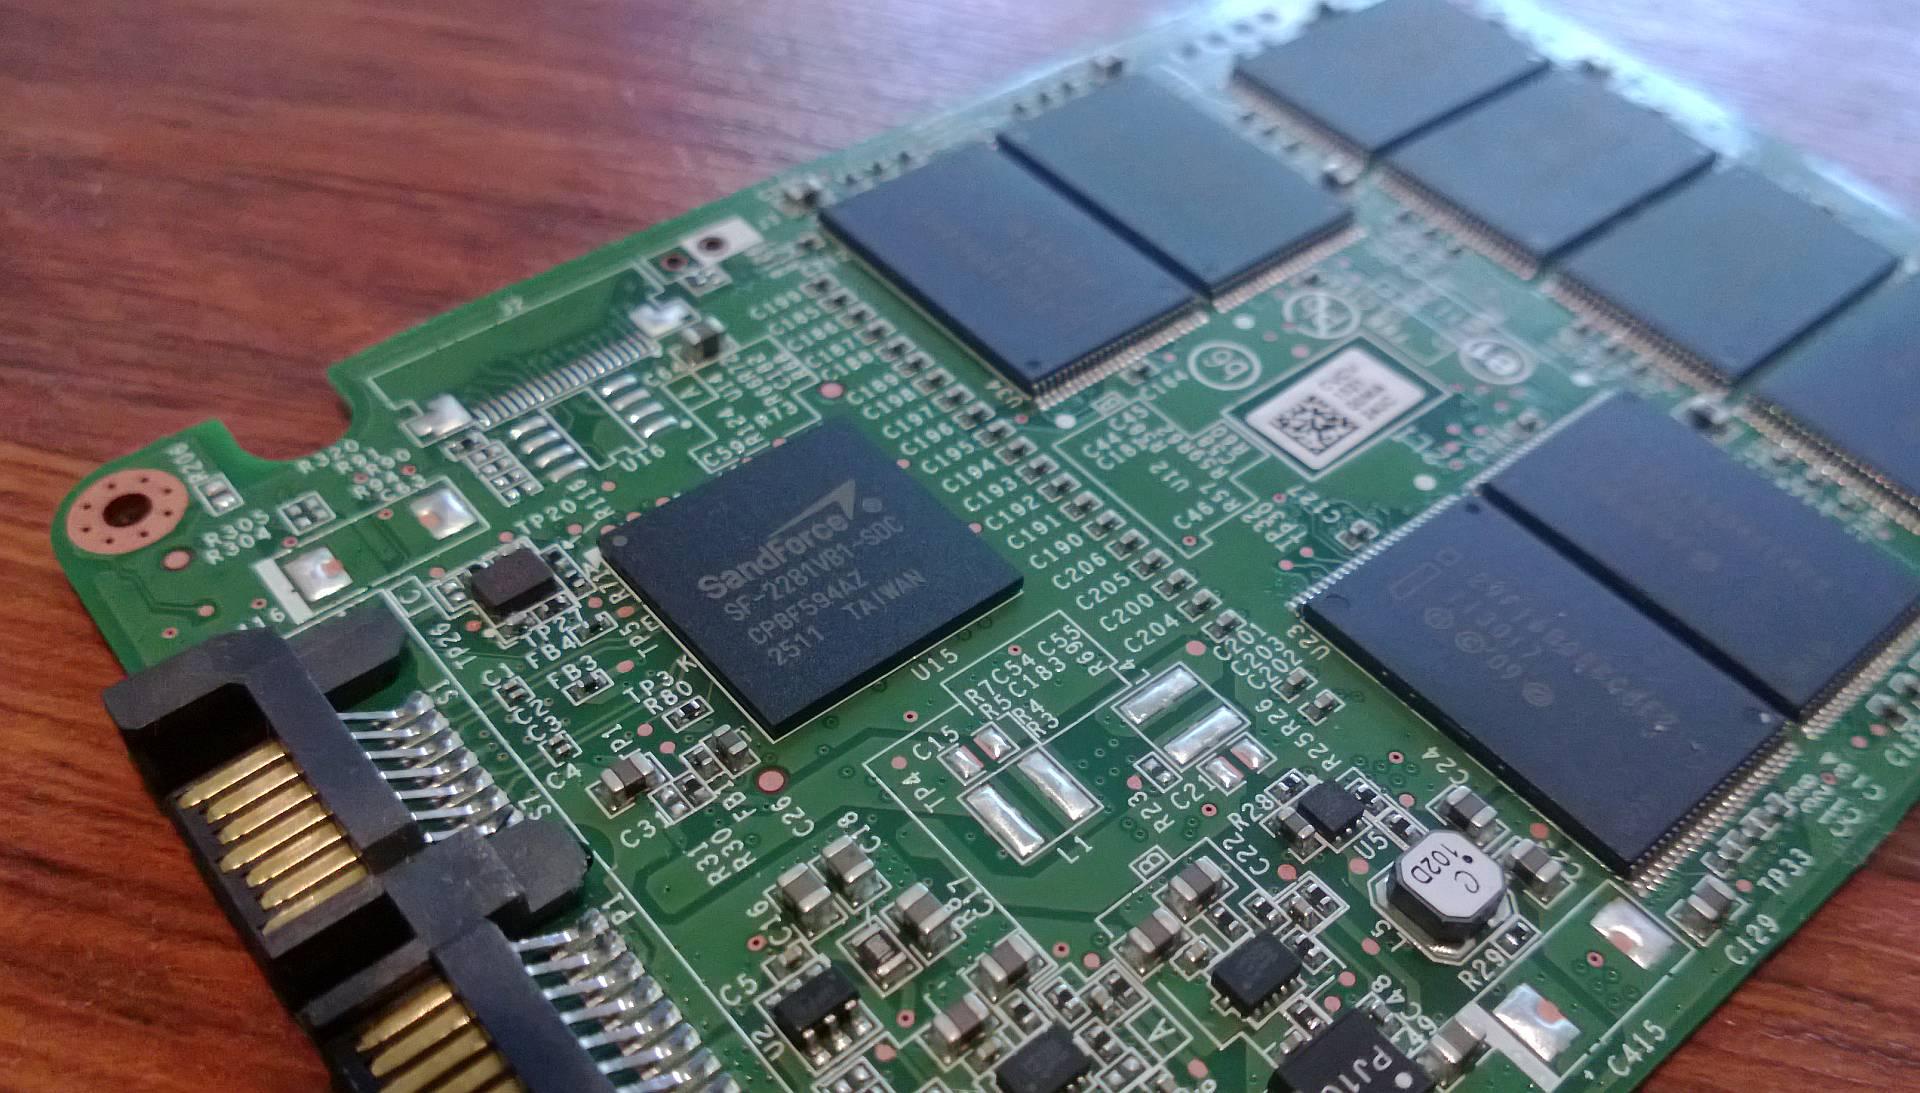 Intel SSD 520 240 GB – Performanta necesara pentru sistem [REVIEW]